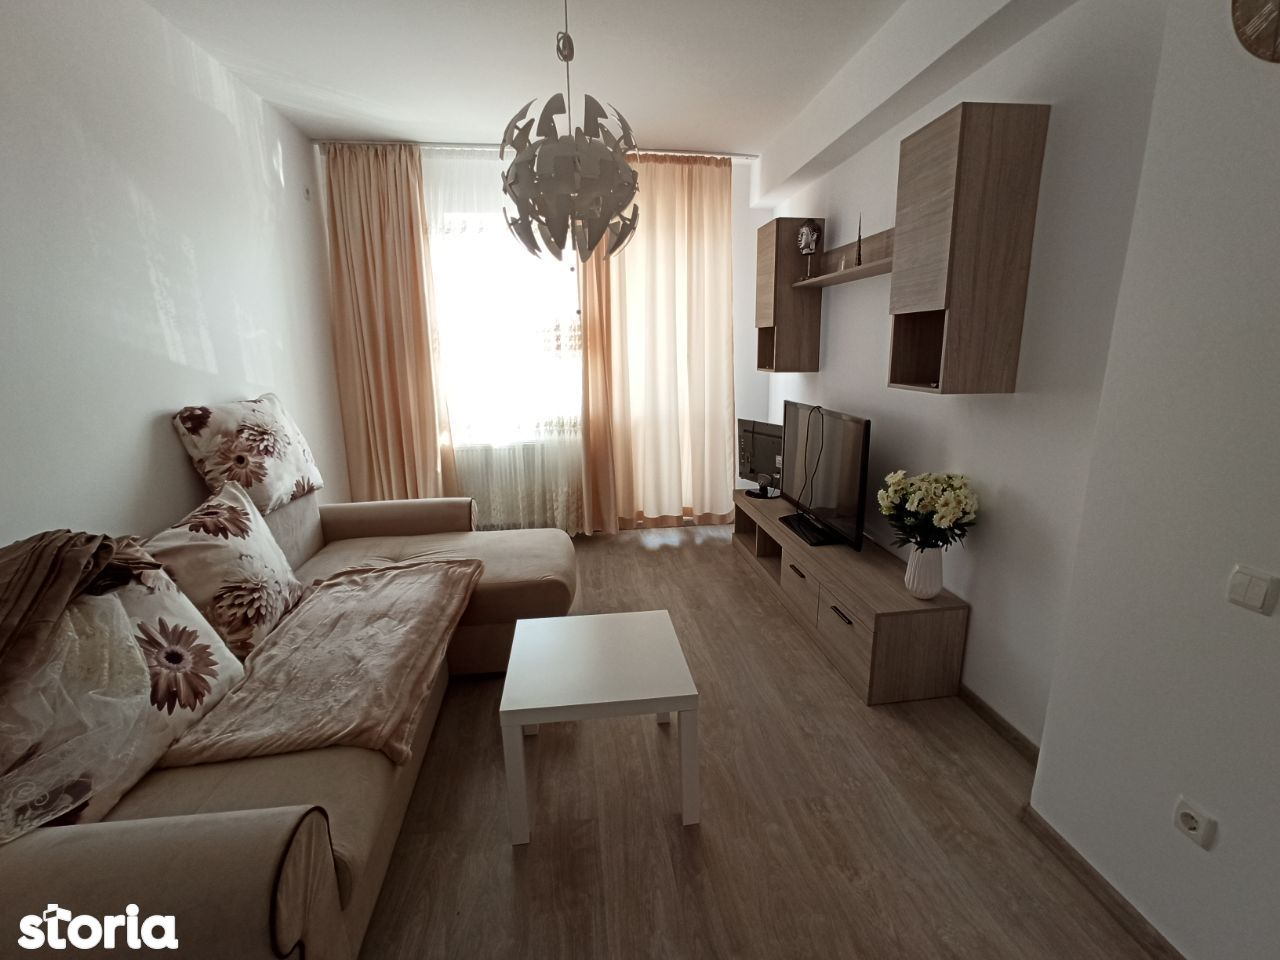 Apartament nou 3 camere mobilat, 2 bai, totul NOU